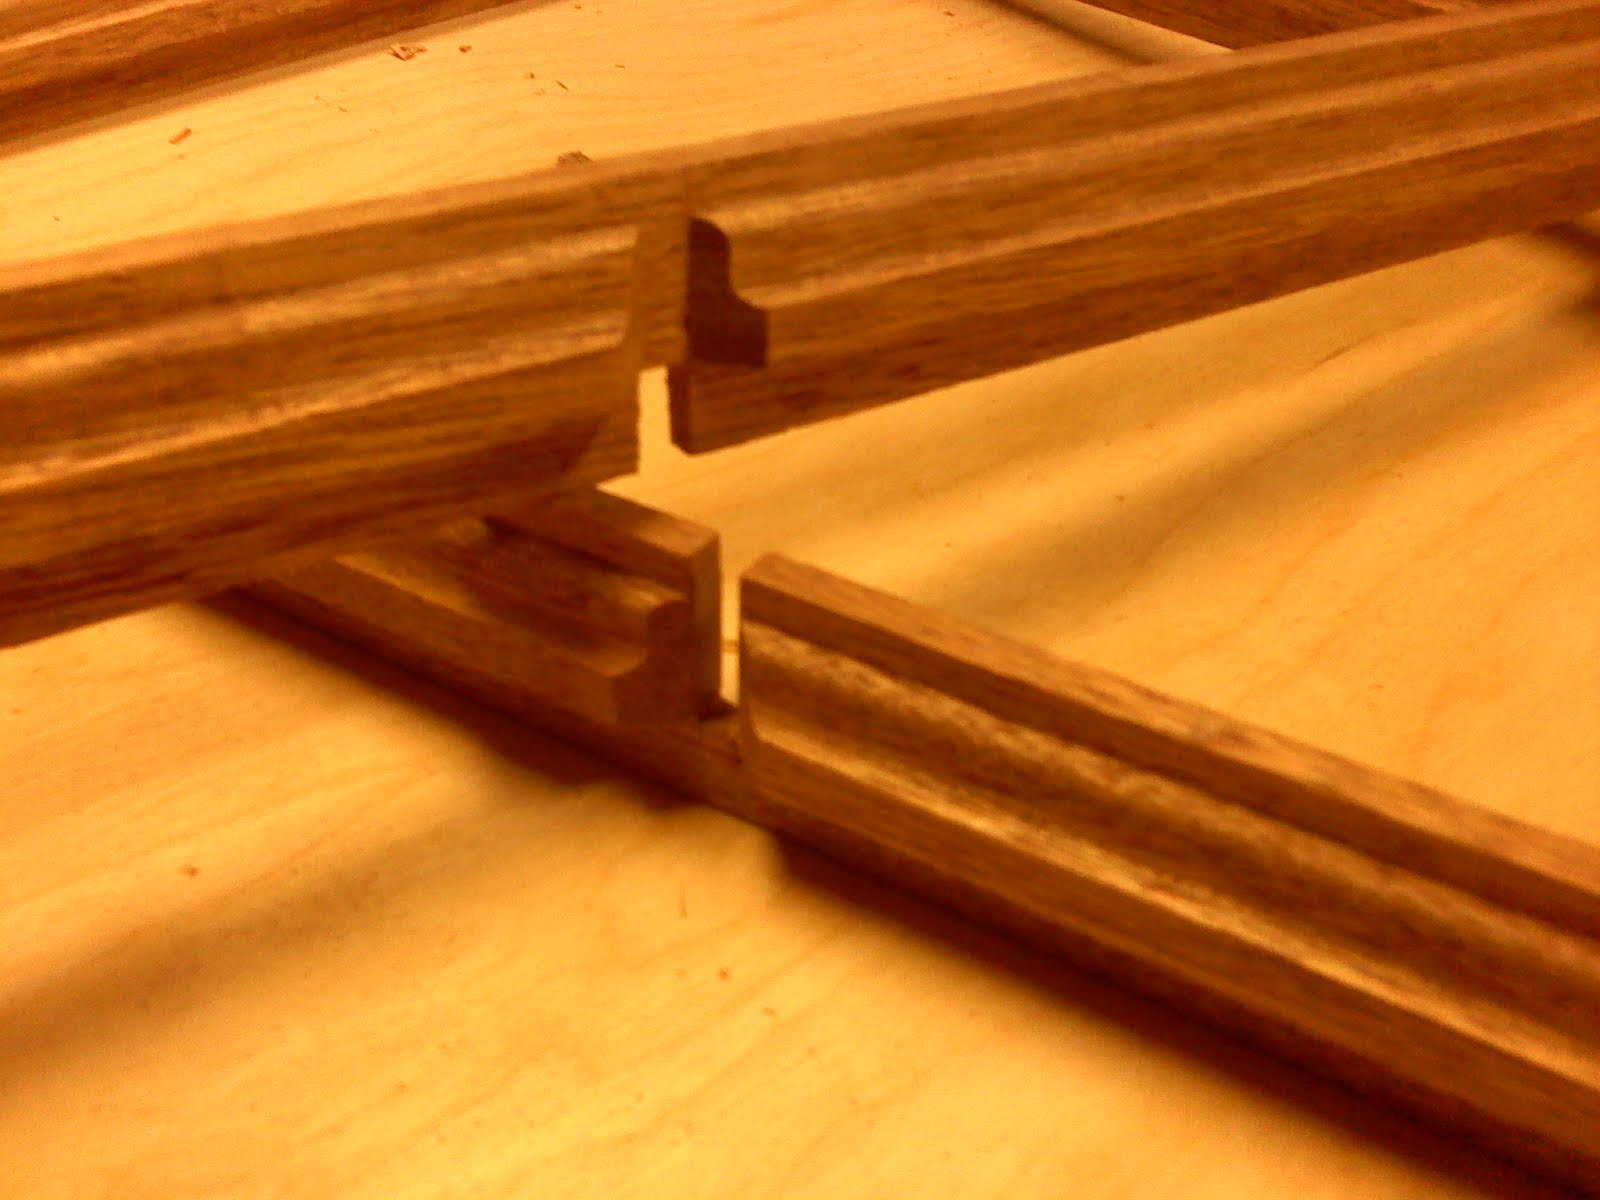 Michael ferrin woodworking making window sash